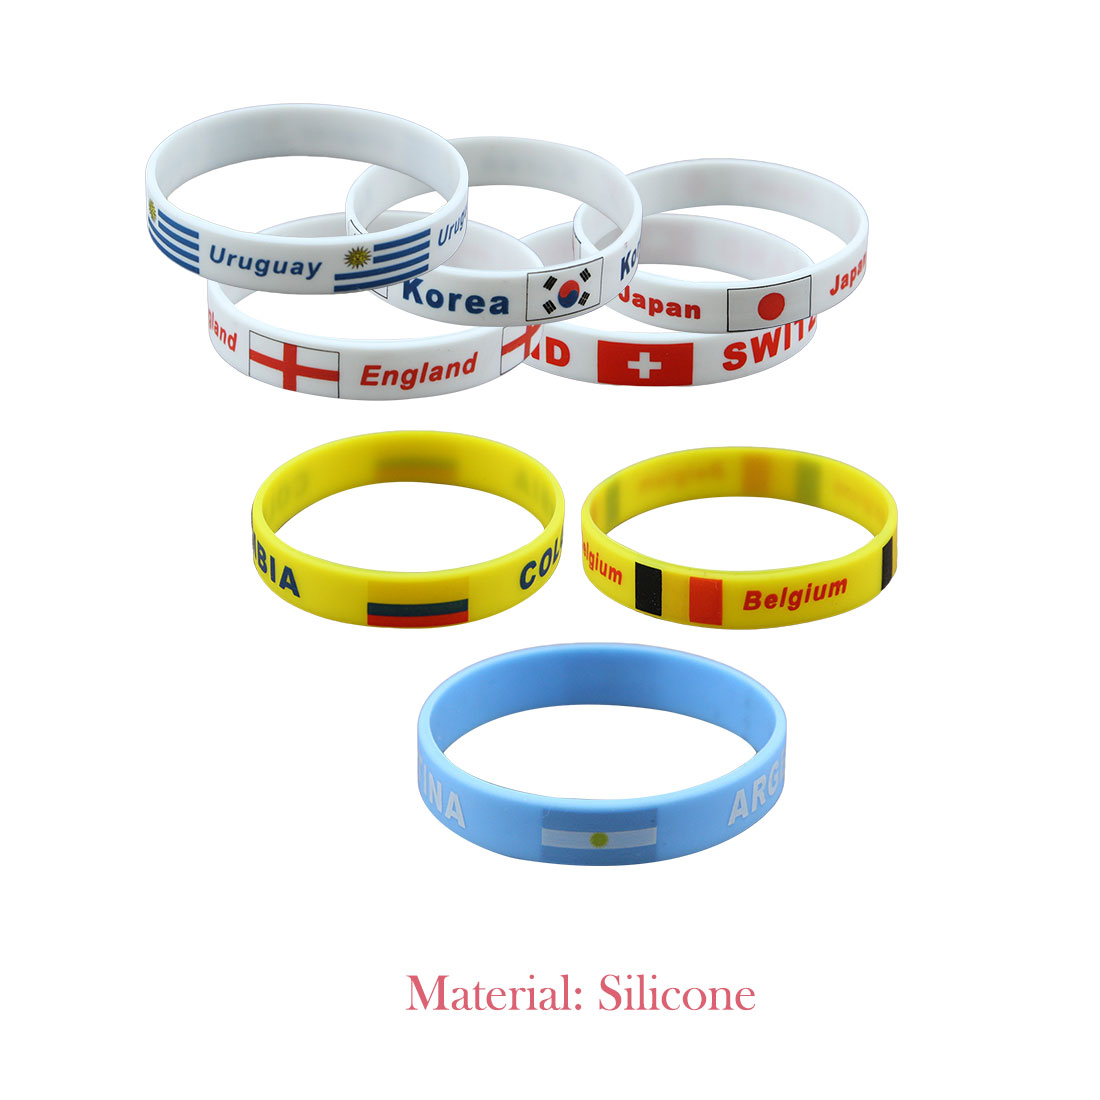 Brand New 1pcs Football Fans Bracelet Soccer fan Accessories Football Silicone Bracelet Cheerleading supplies